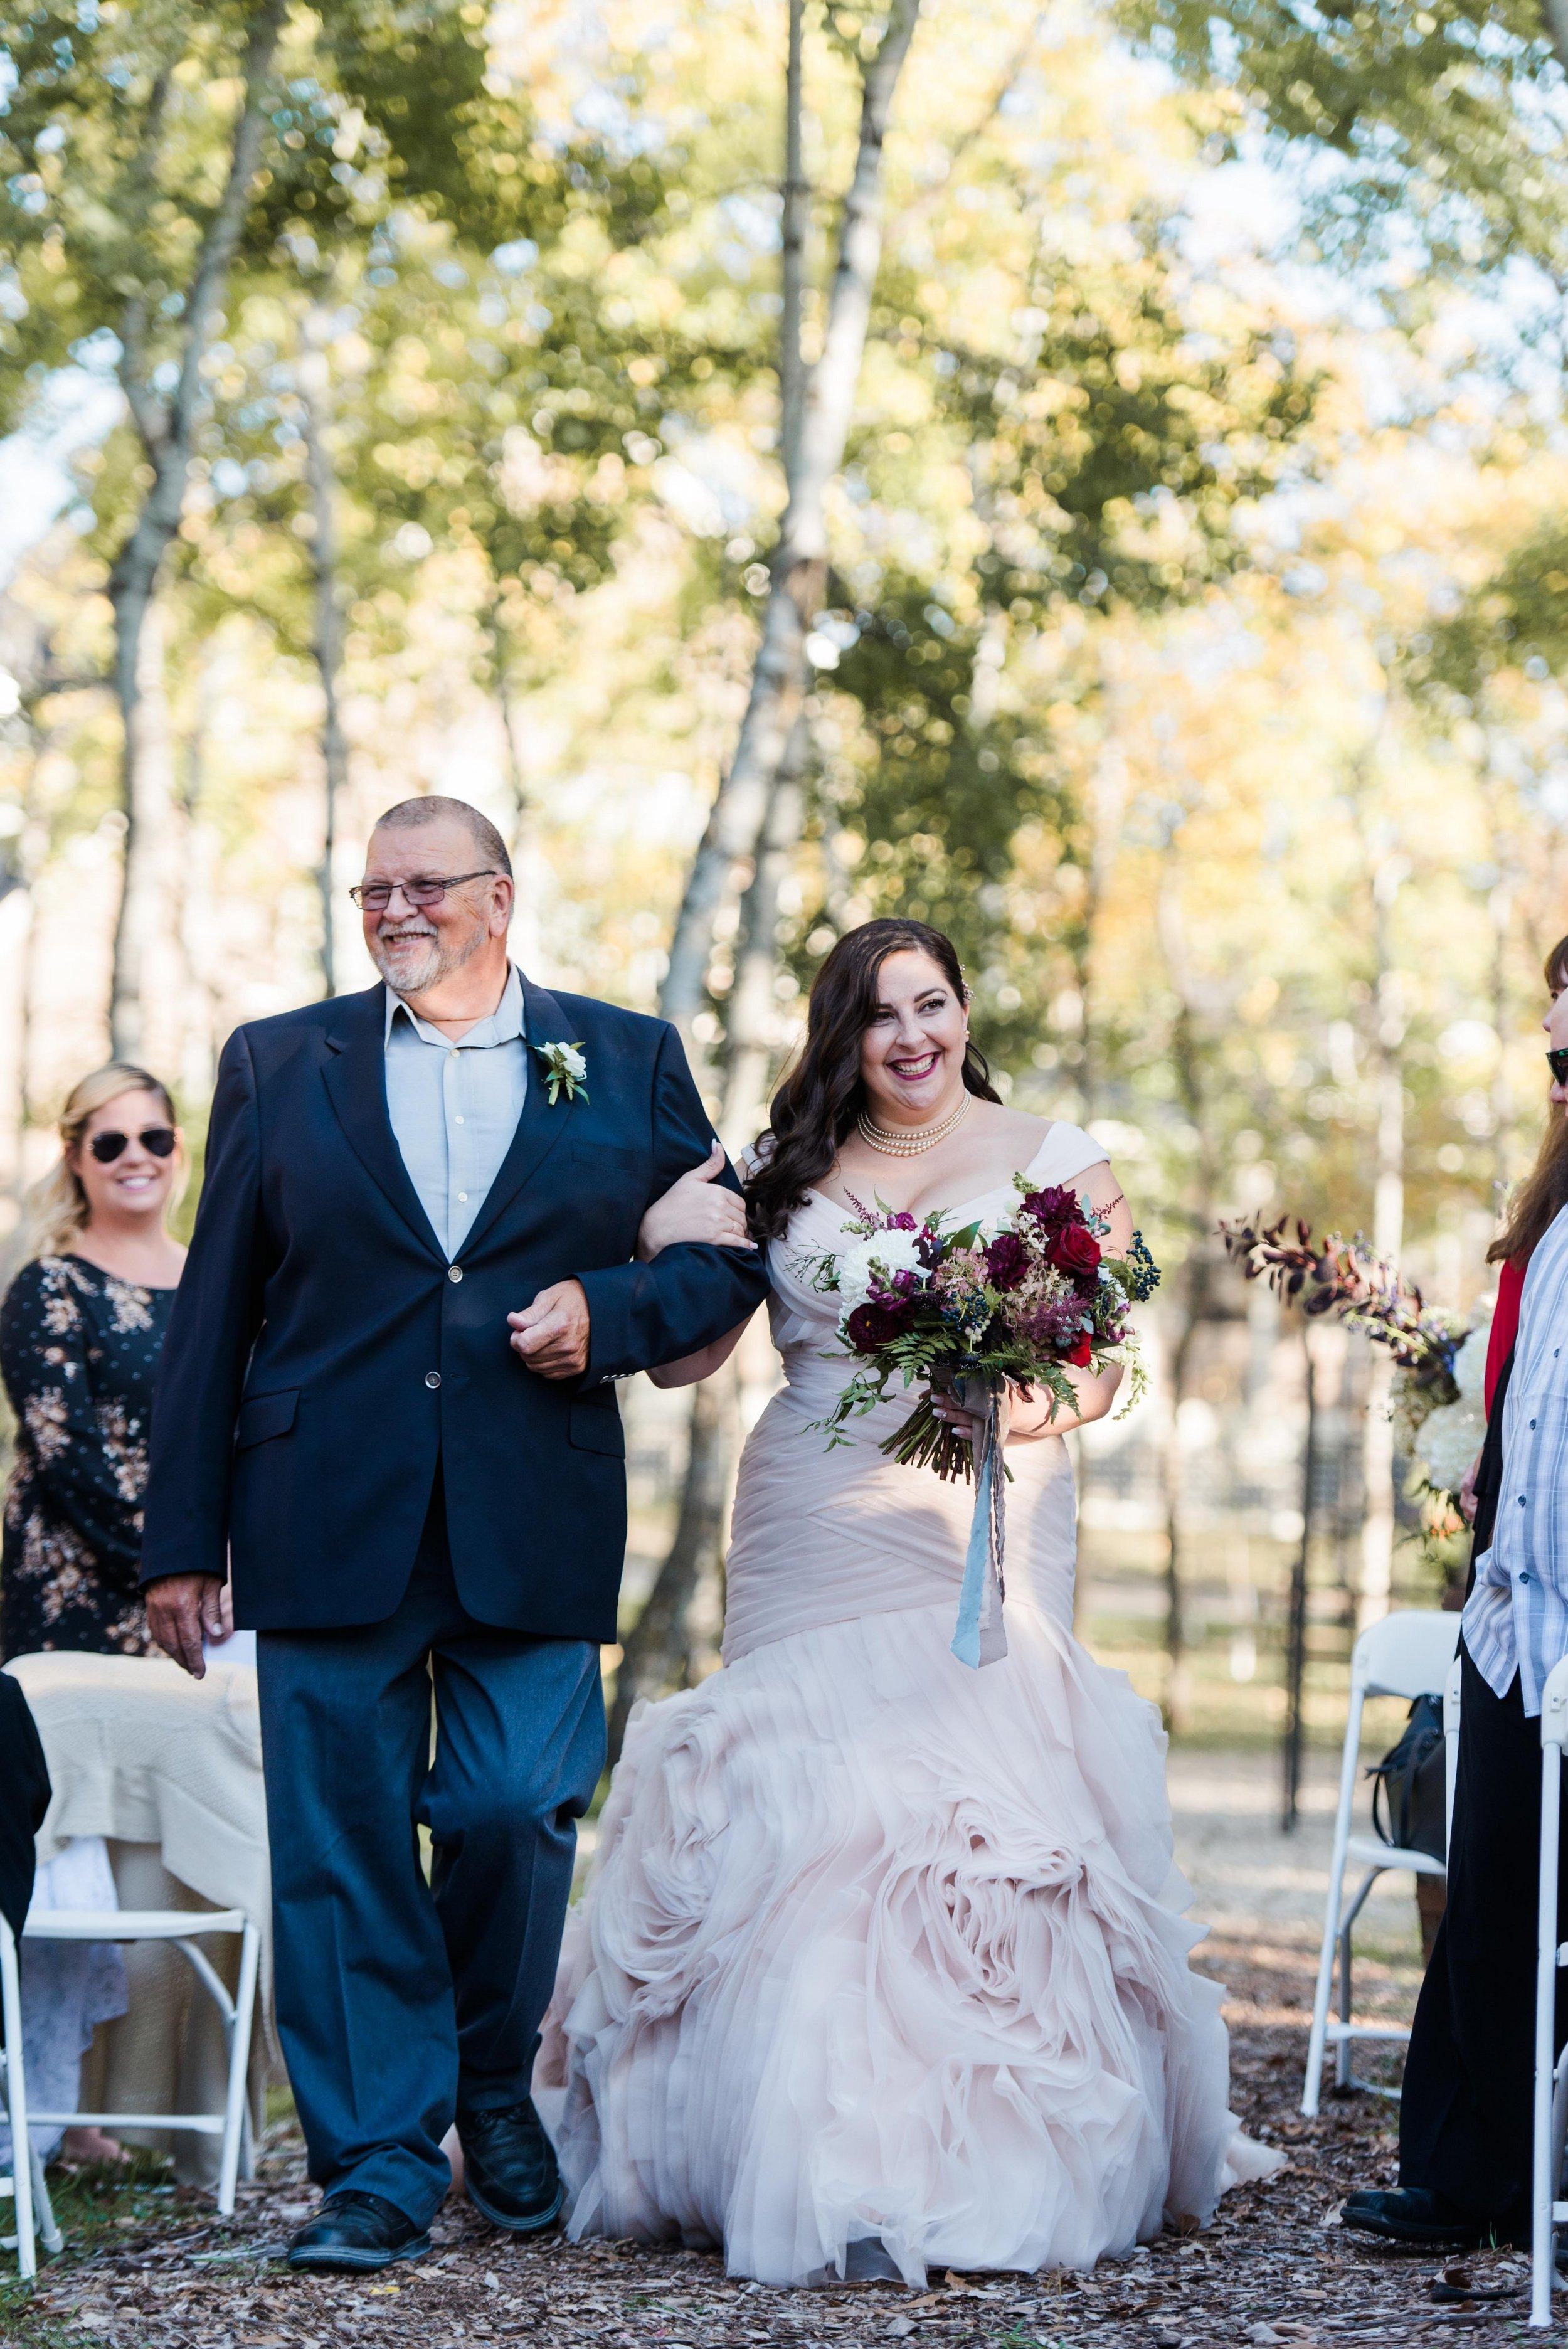 Outdoor Wedding Ceremony - Wedding Florists Winnipeg